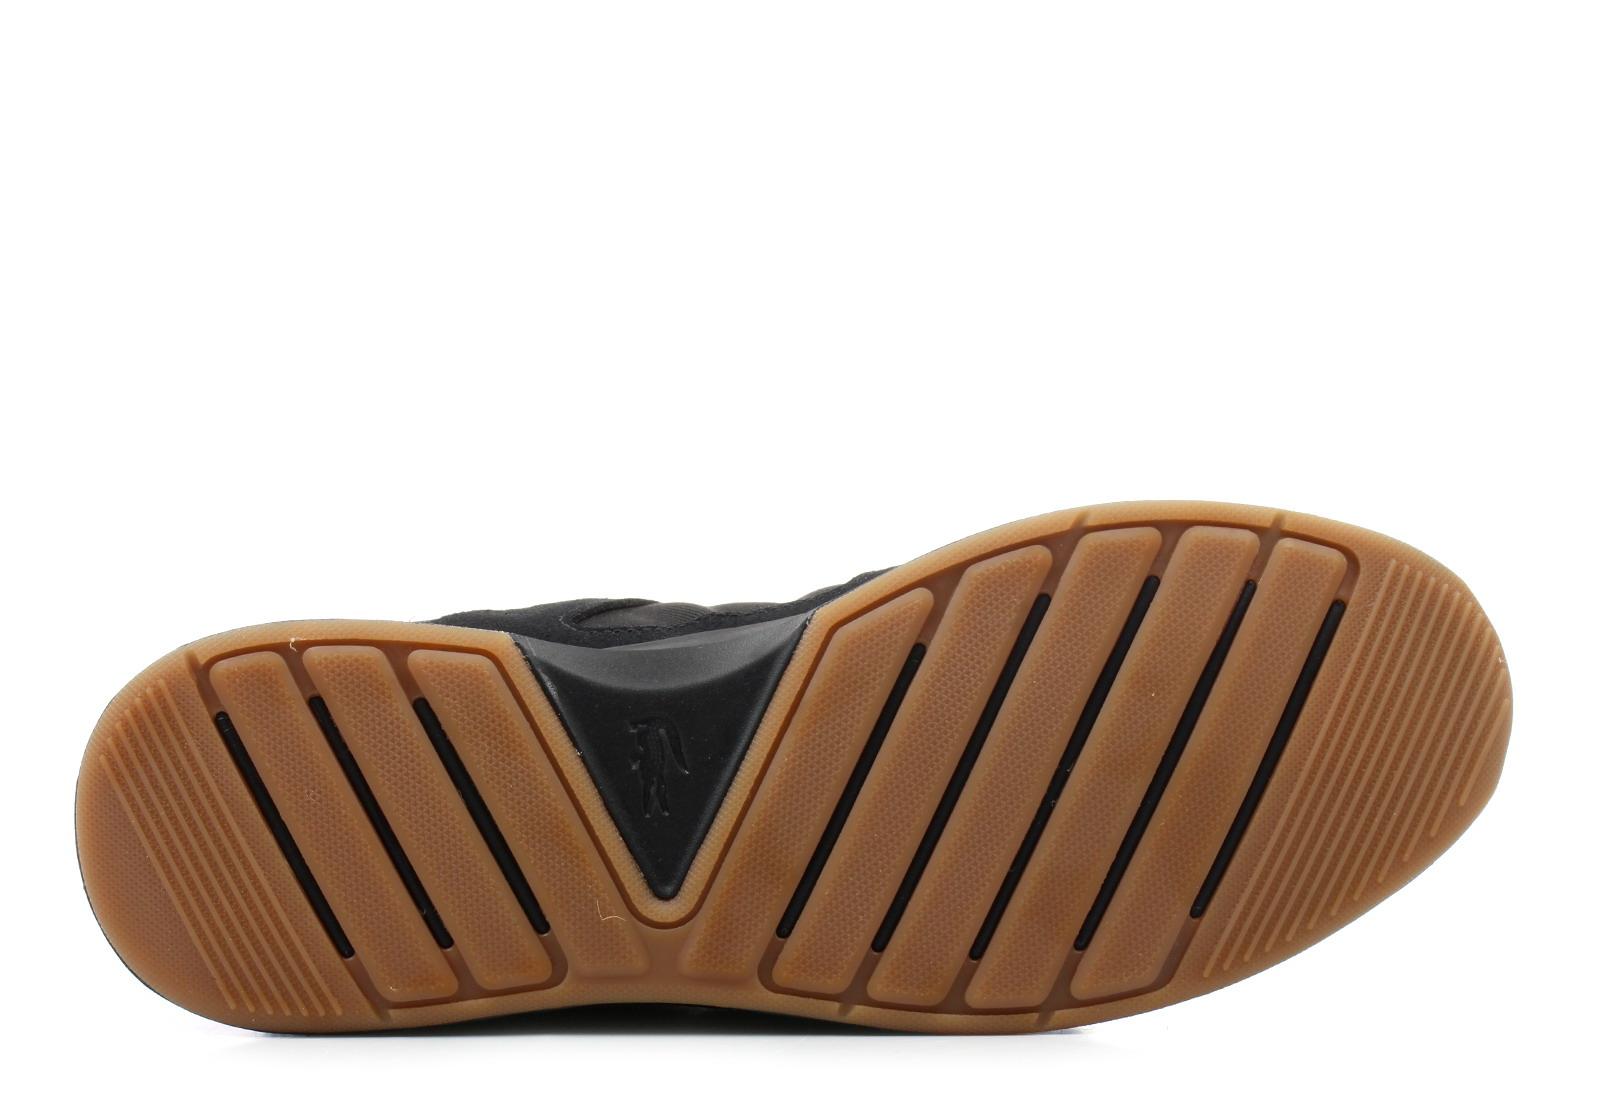 Lacoste Cipő - Joggeur - 183SPM0003-02H - Office Shoes Magyarország f69141534f